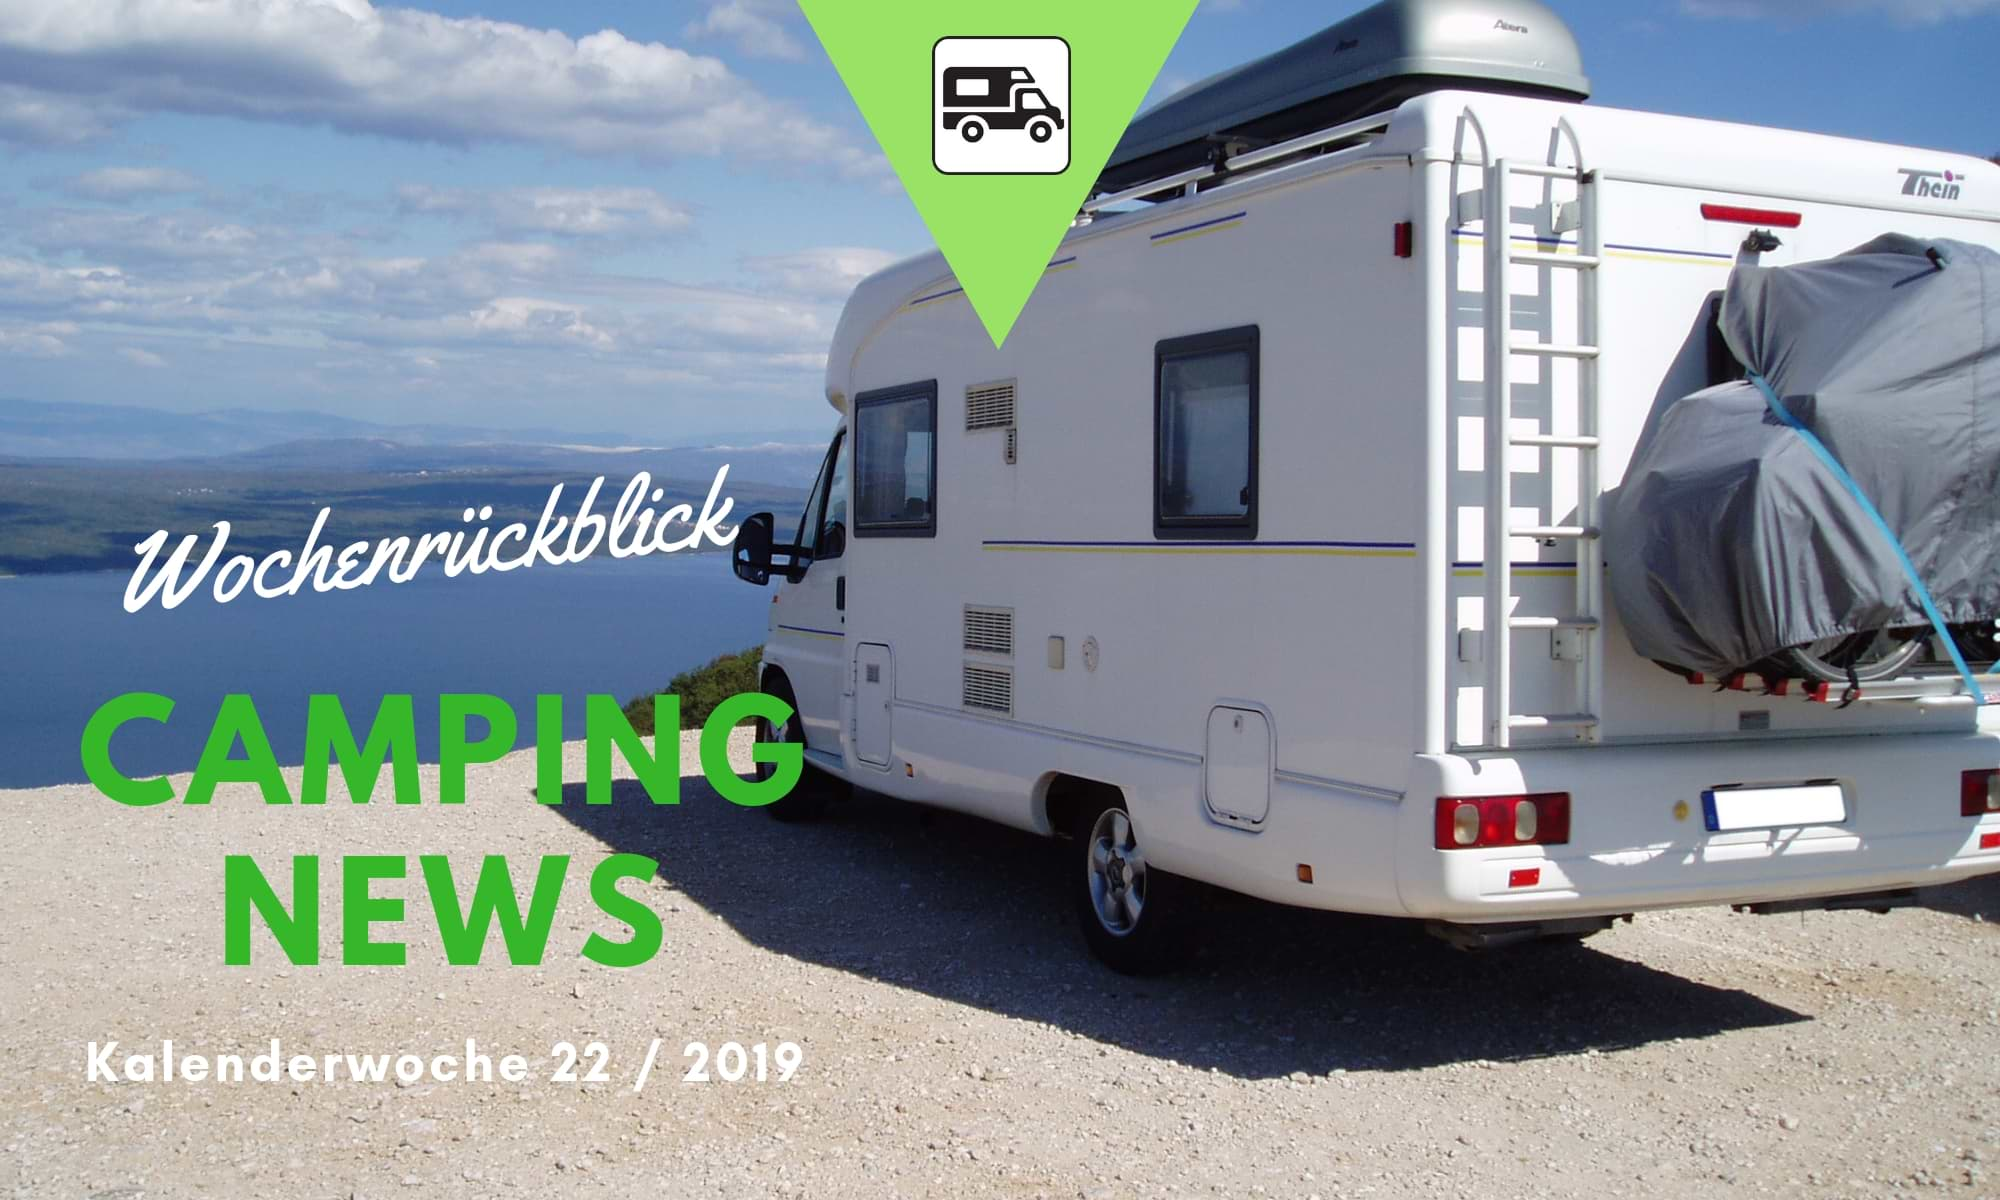 Wochenrückblick Camping News KW22-2019